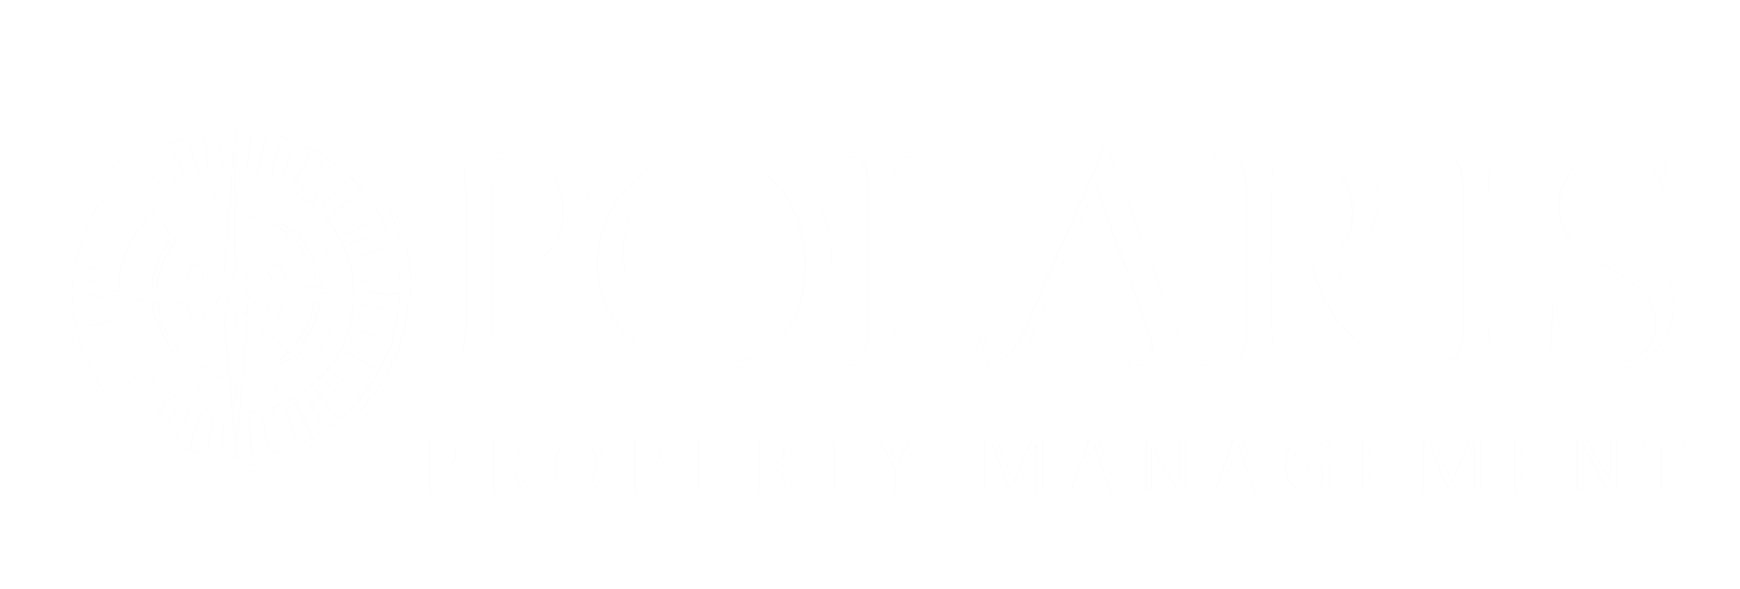 Company logo at Hollywood Tower in Los Angeles, CA 90028